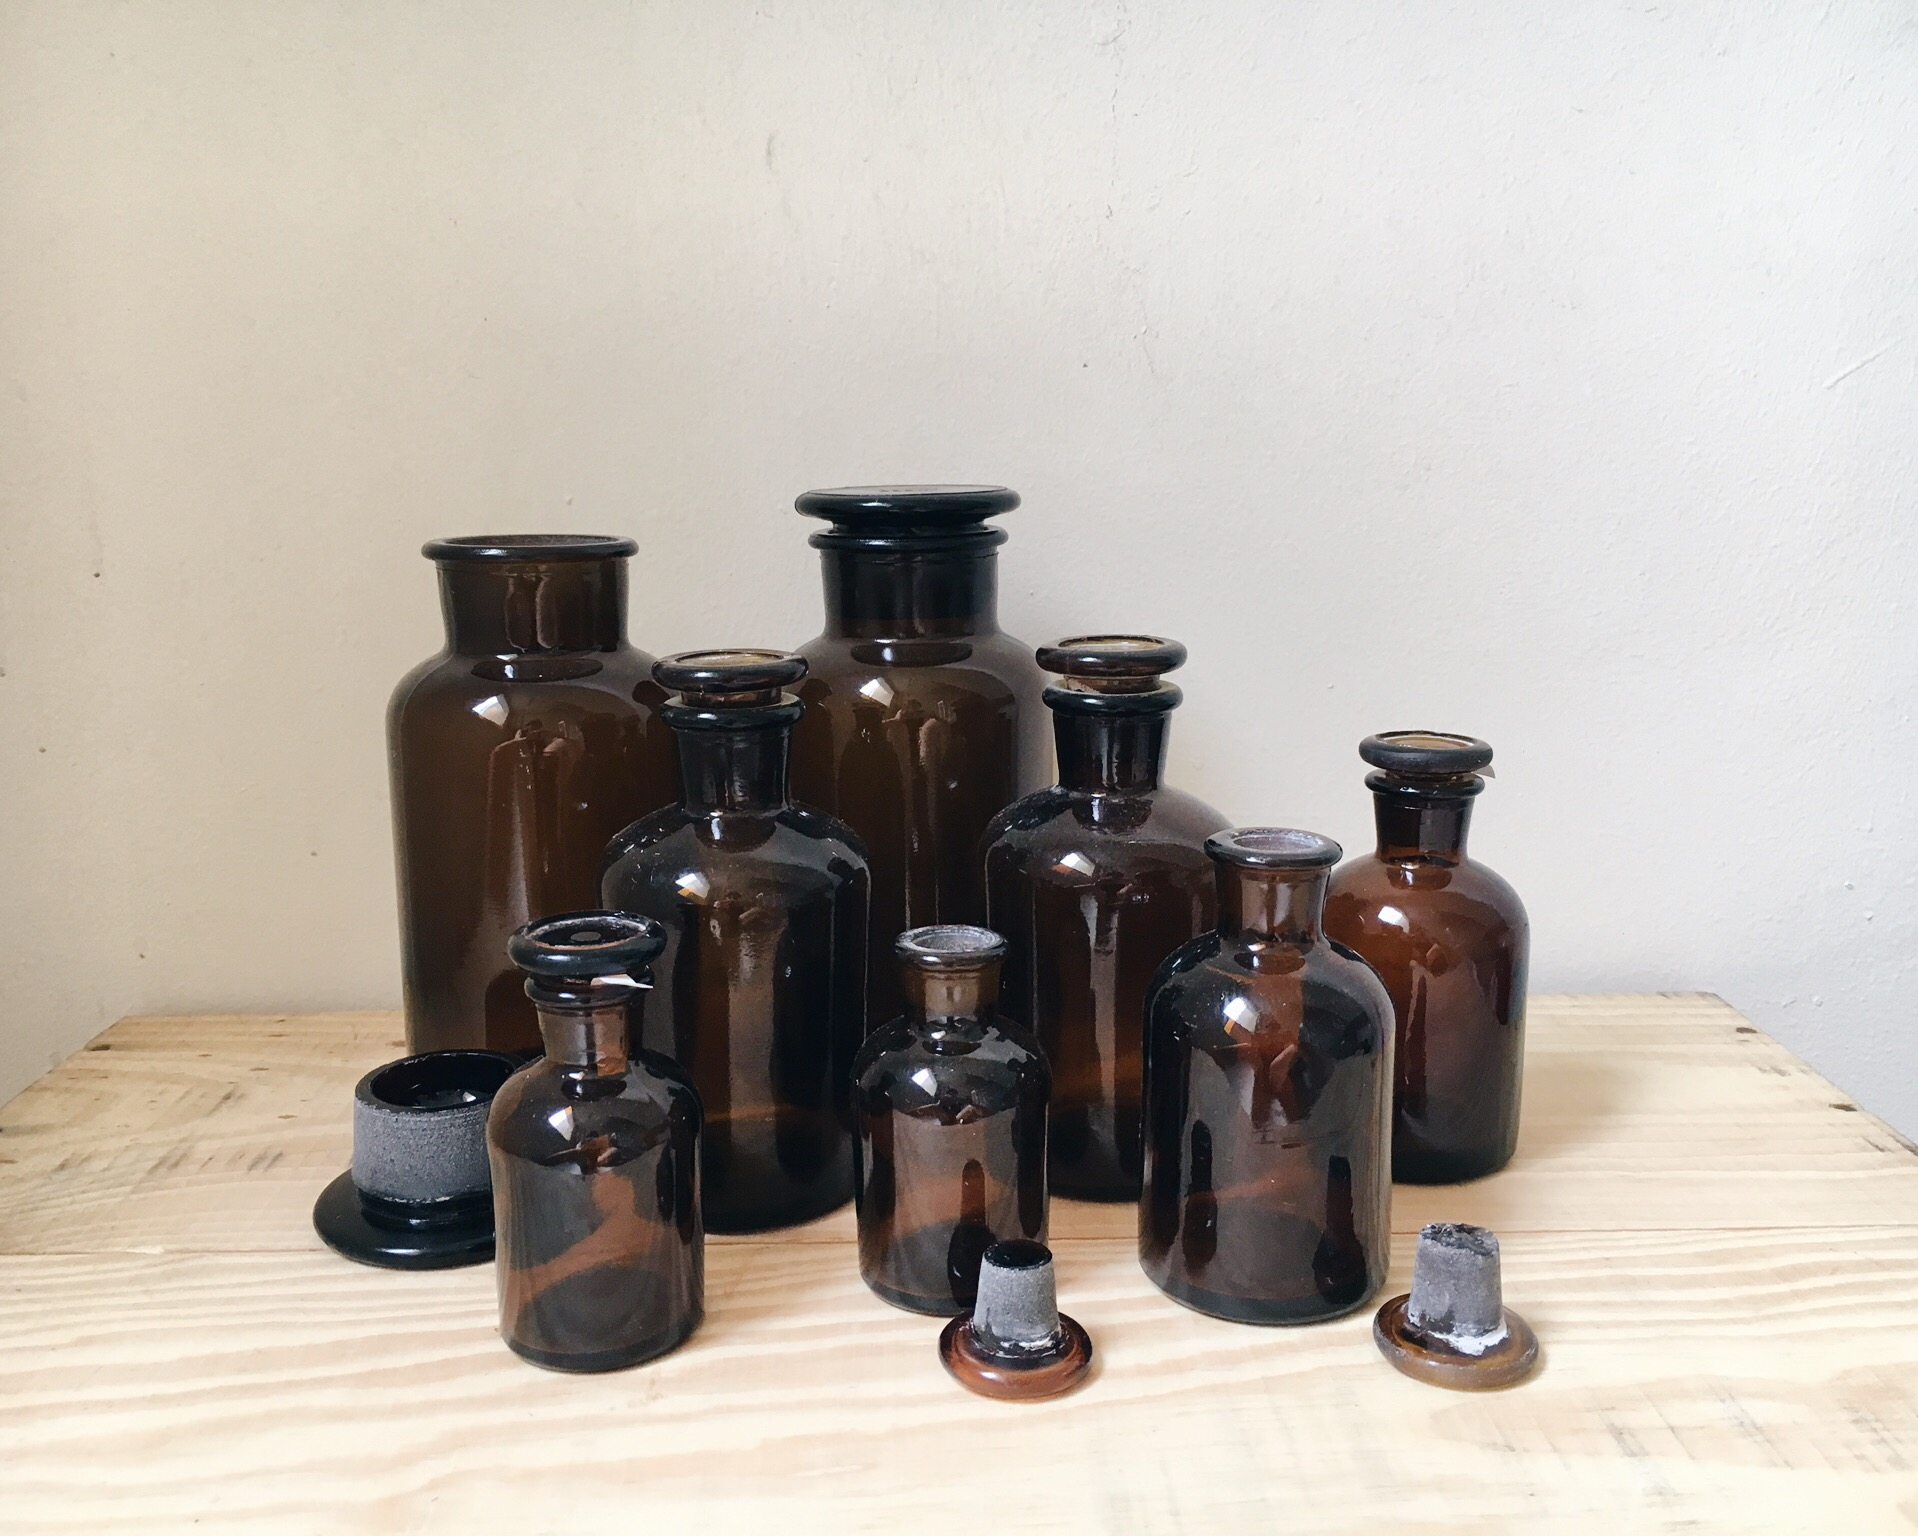 glassware apothecary bottles 3.JPG